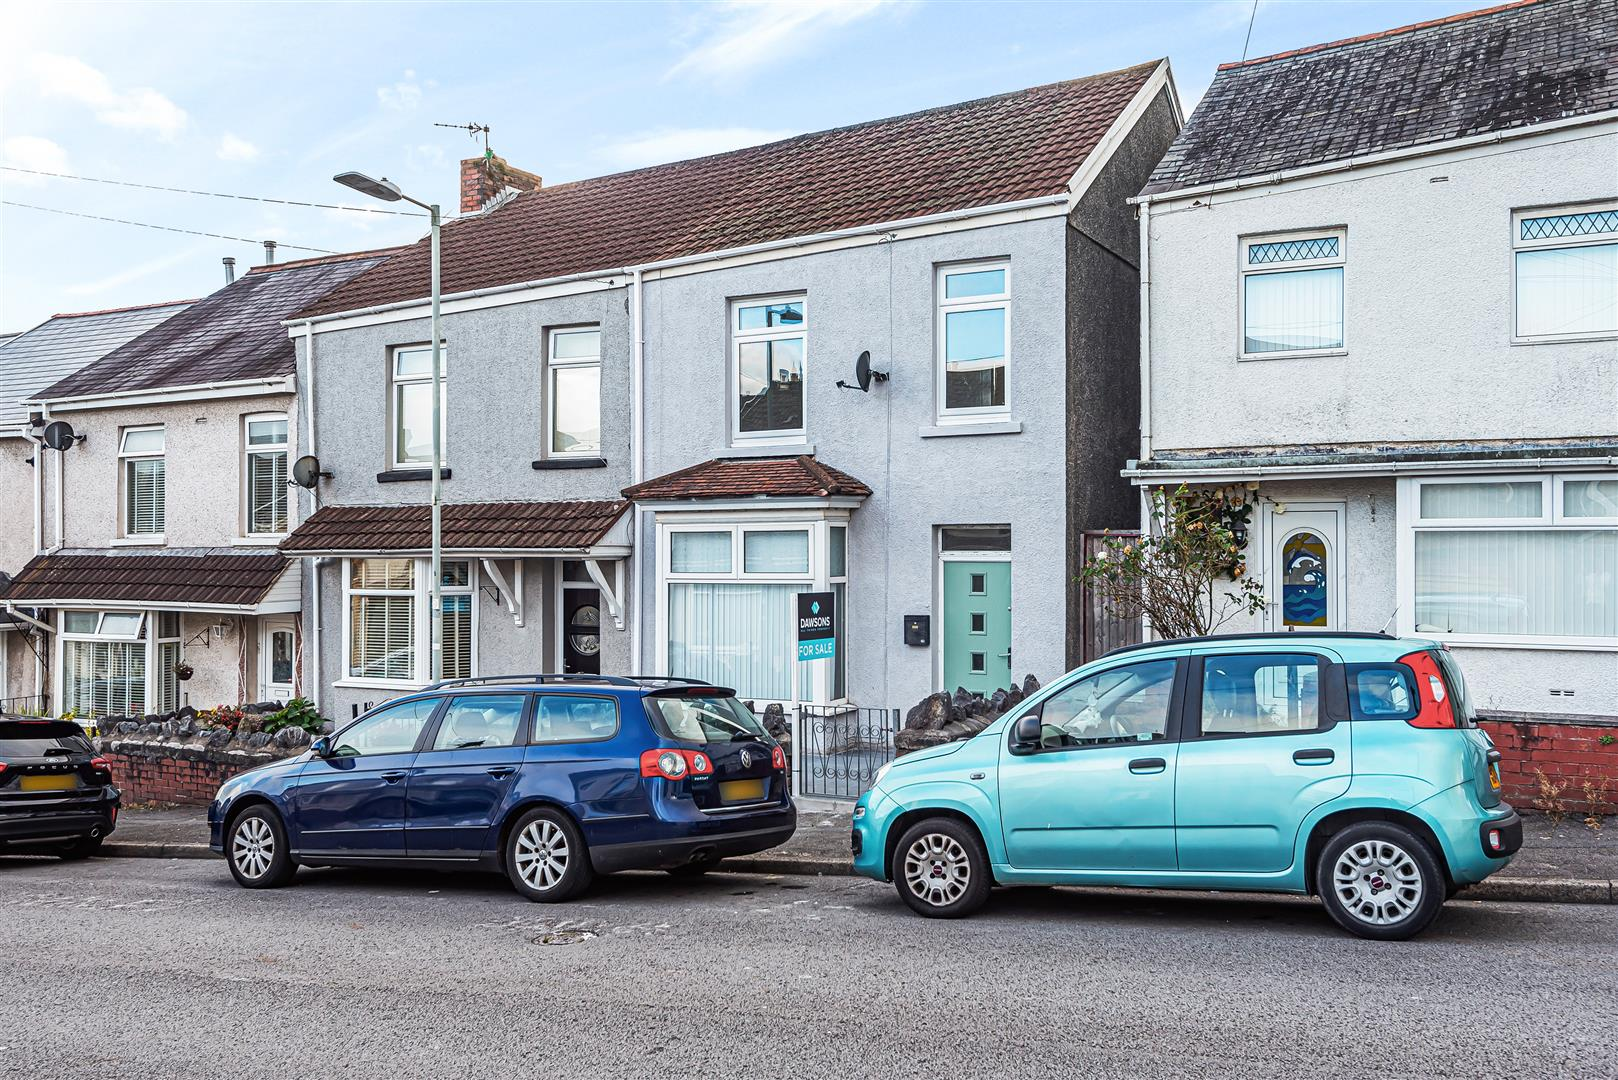 Cecil Street, Manselton, Swansea, SA5 8QJ